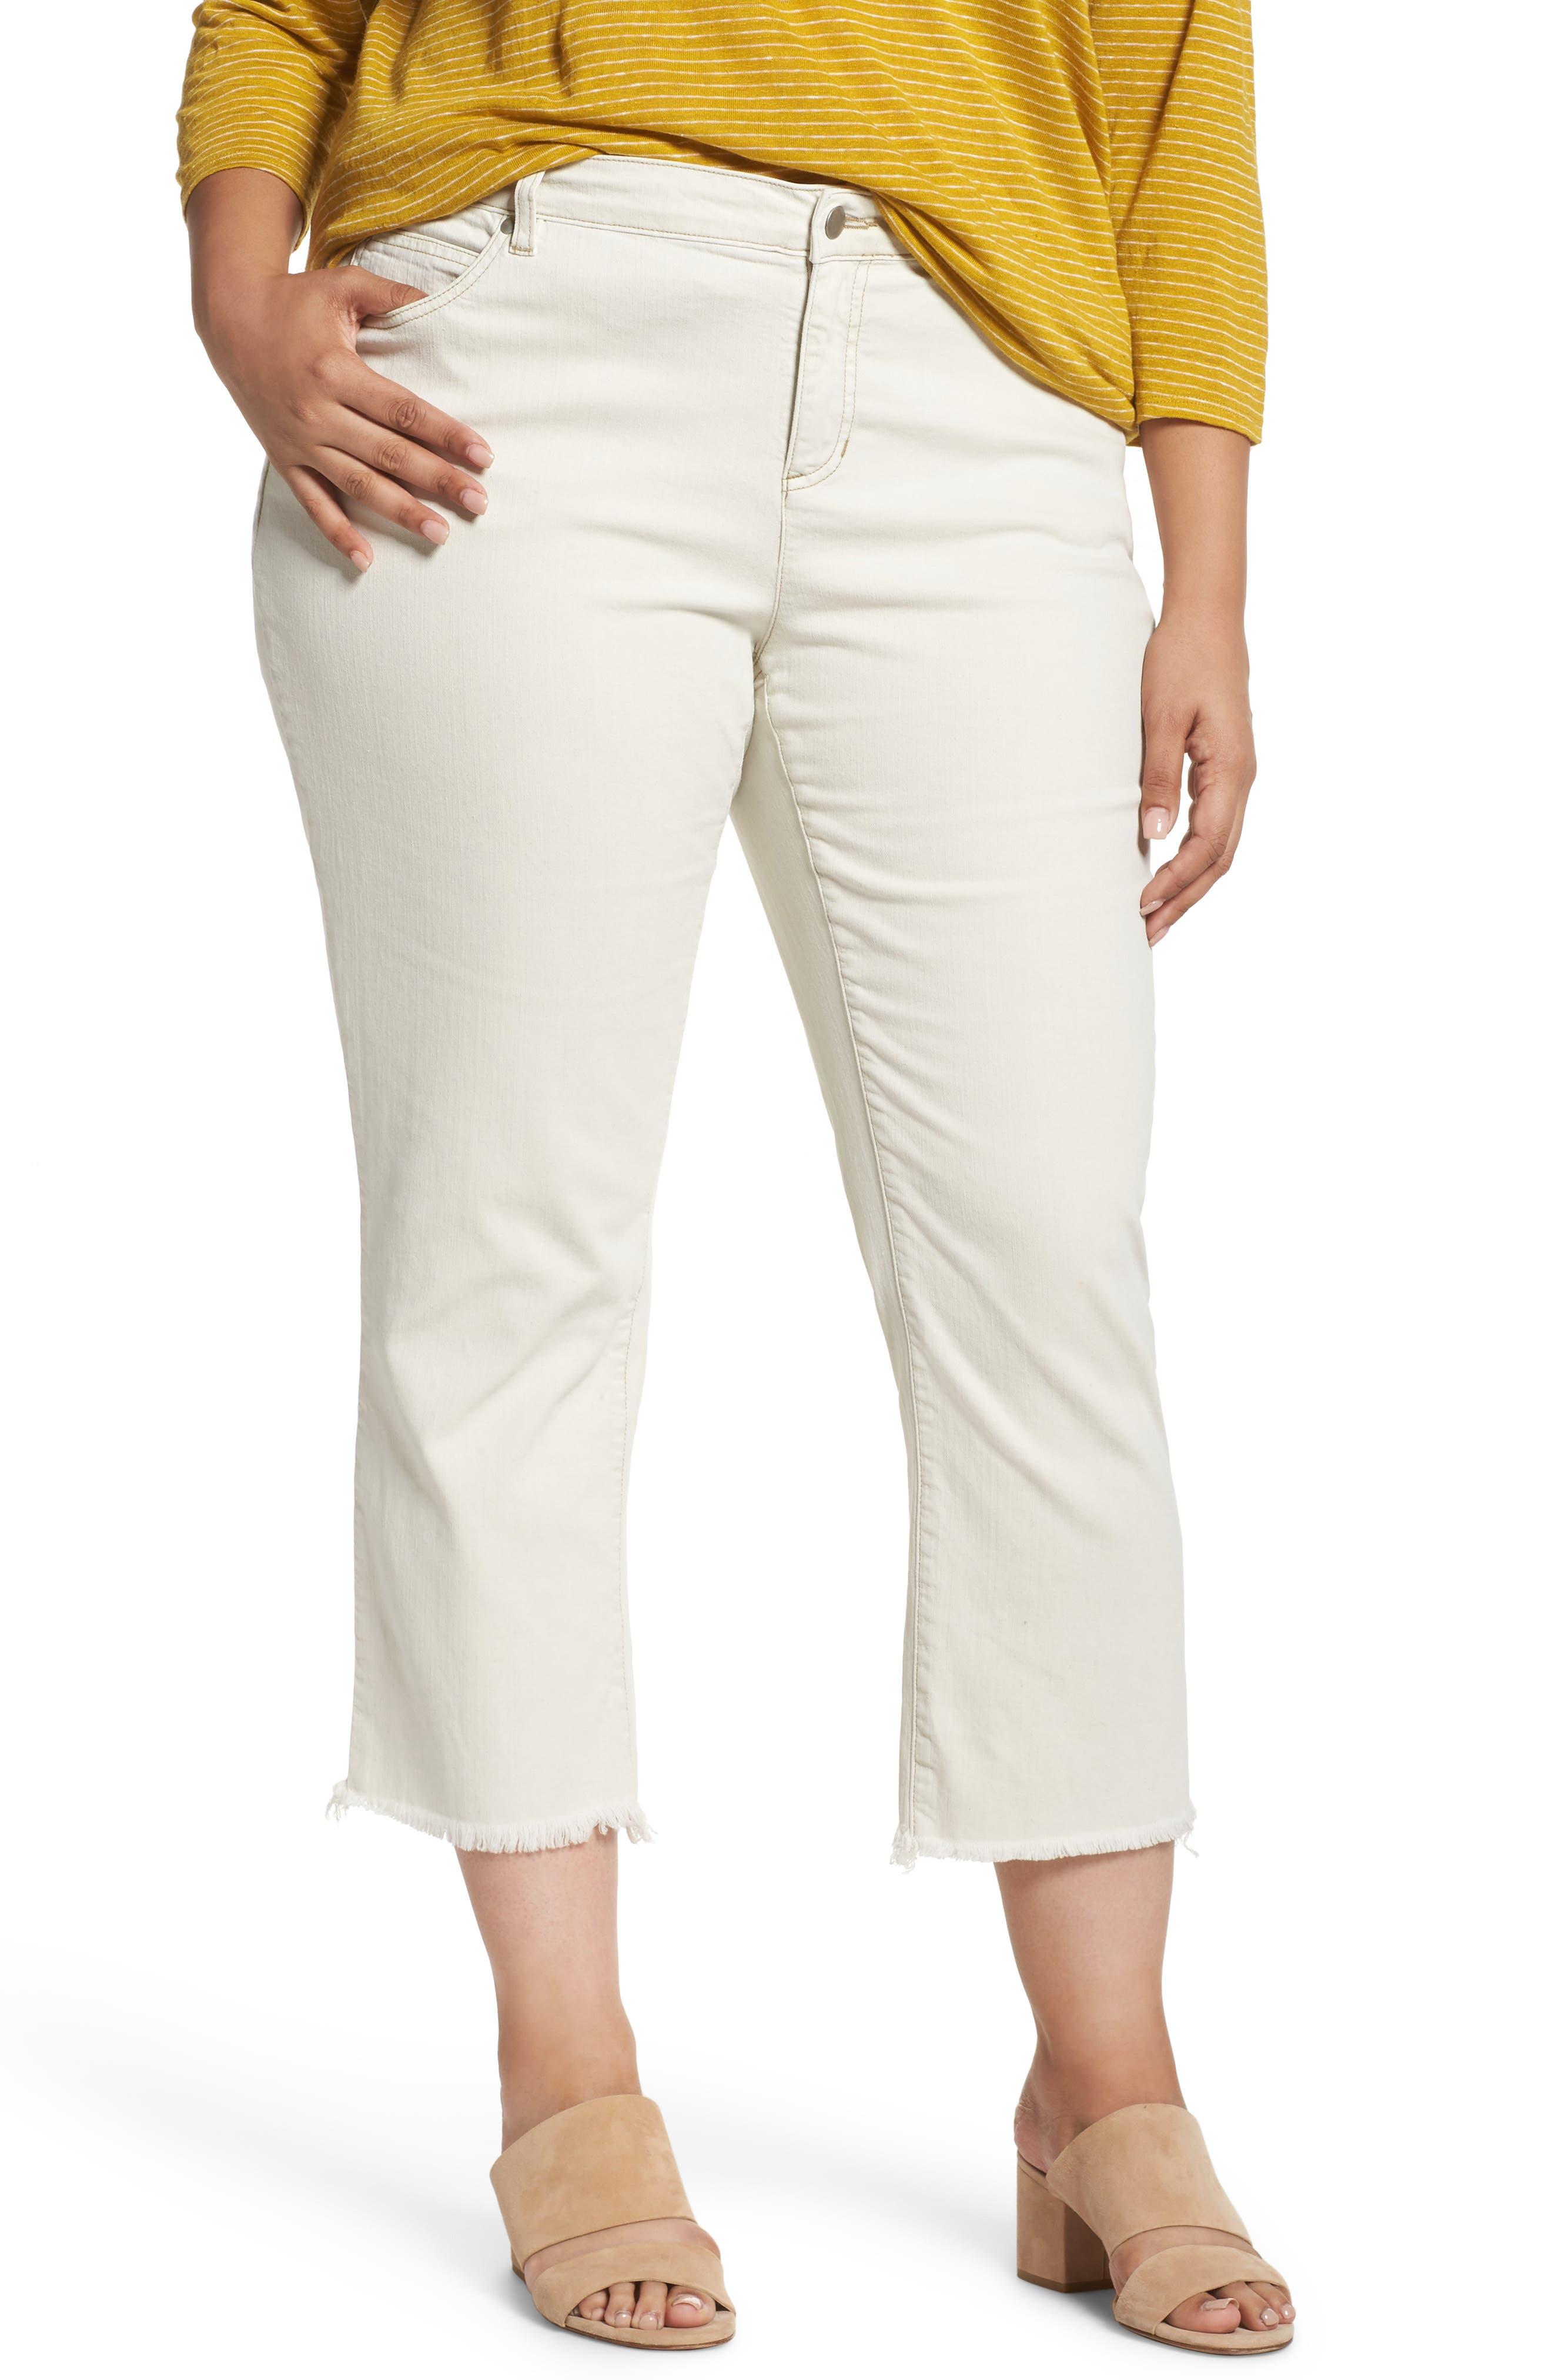 Stretch Organic Denim Crop Jeans,                             Main thumbnail 1, color,                             251